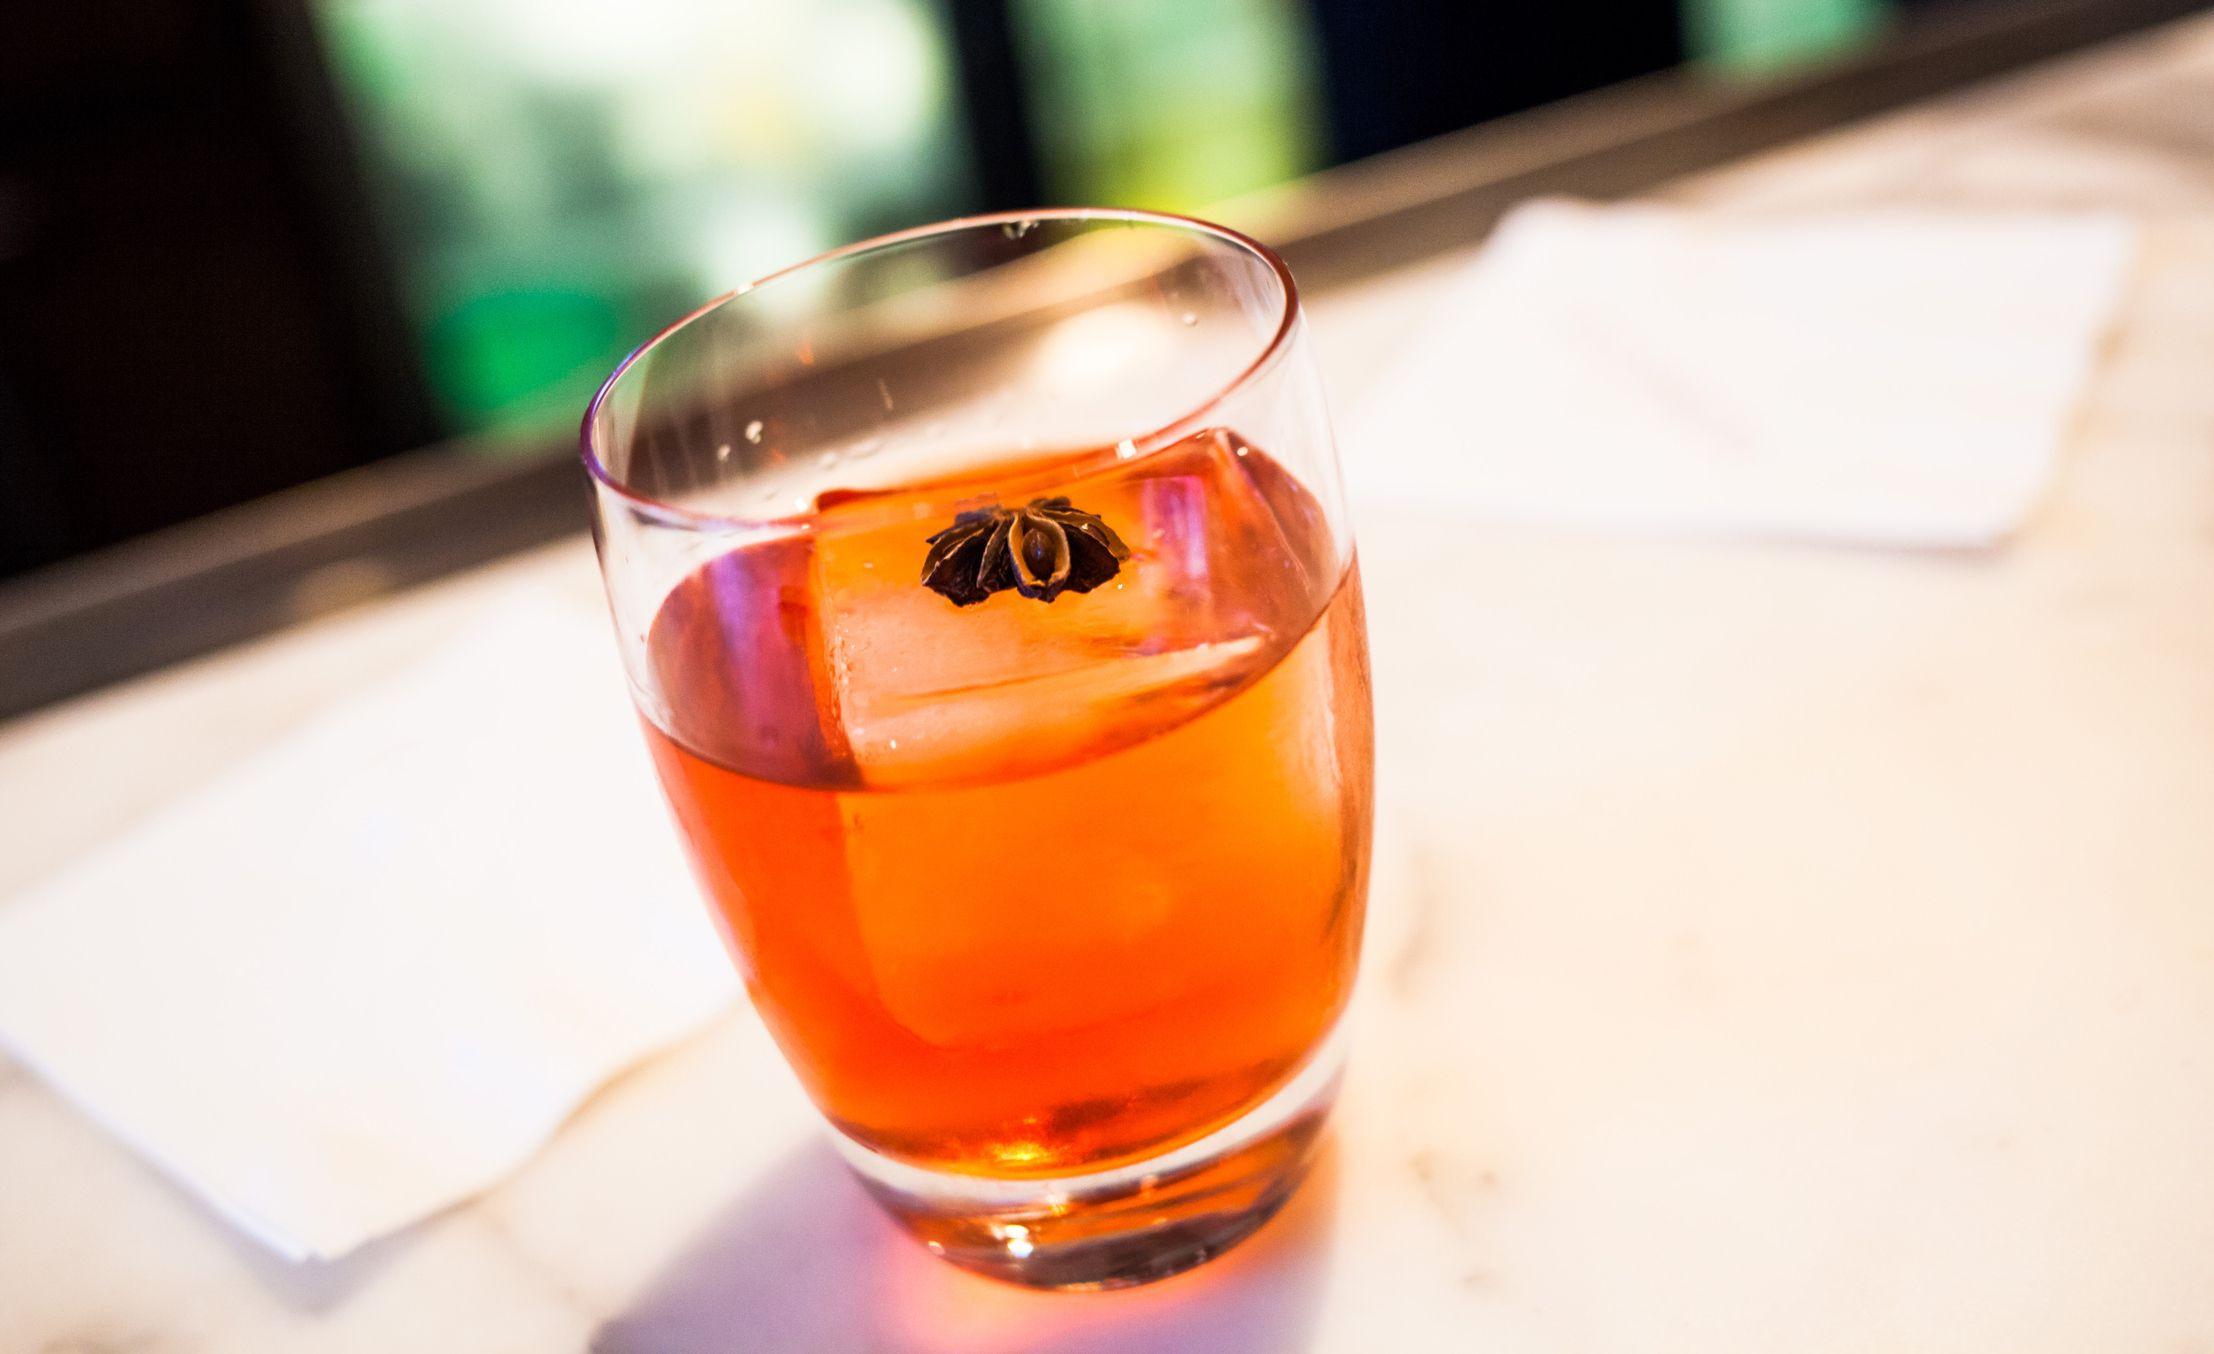 Before Dinner Drinks  10 Impressive Aperitif Cocktails to Serve Before Dinner